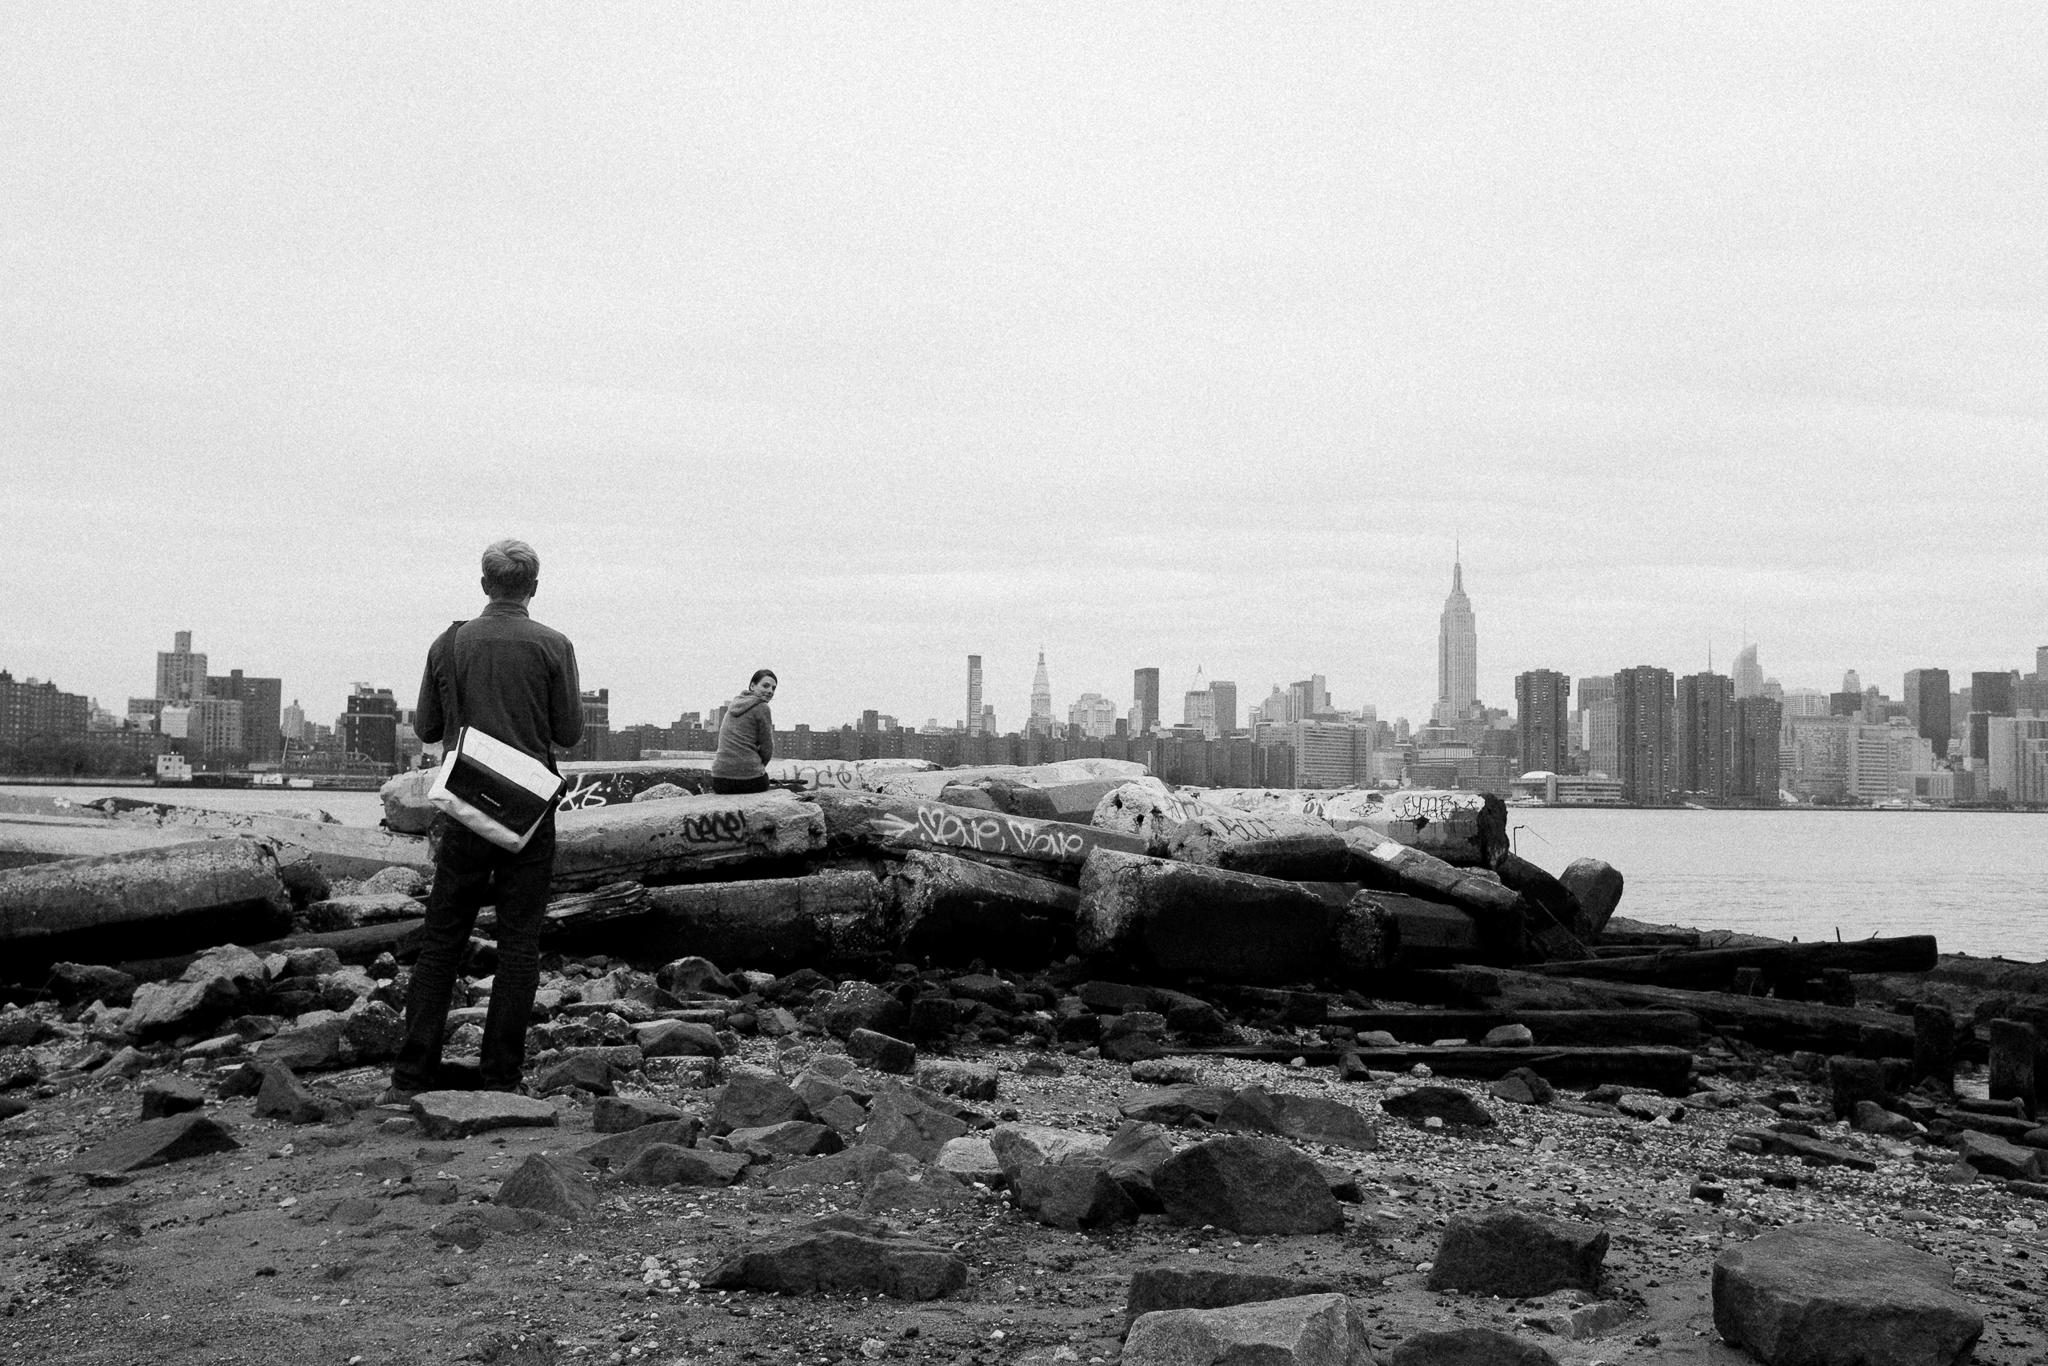 2015-05-14-NYC-1352.jpg